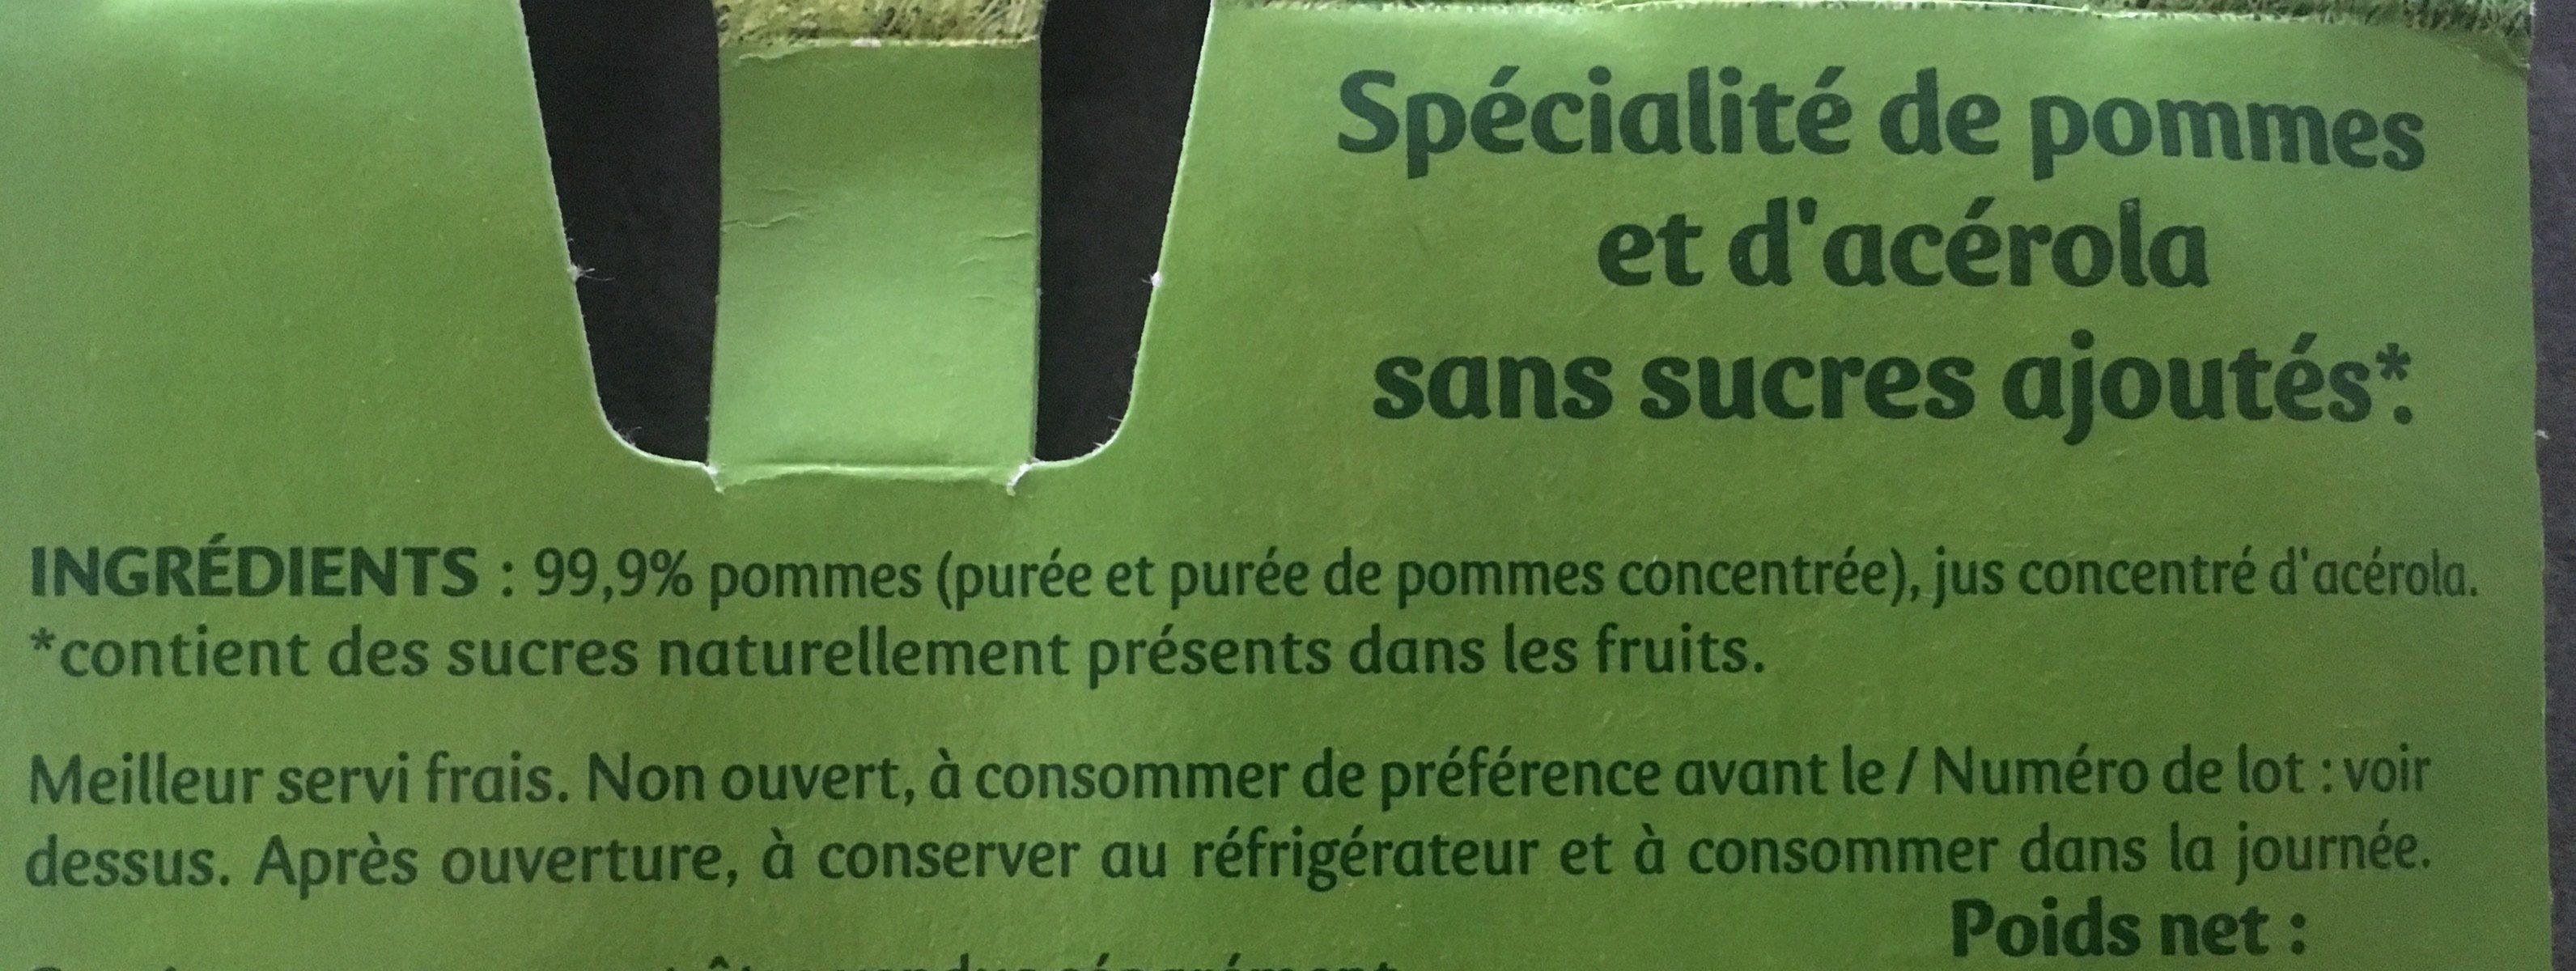 Pommes sans sucres ajoutés pomme - Ingrediënten